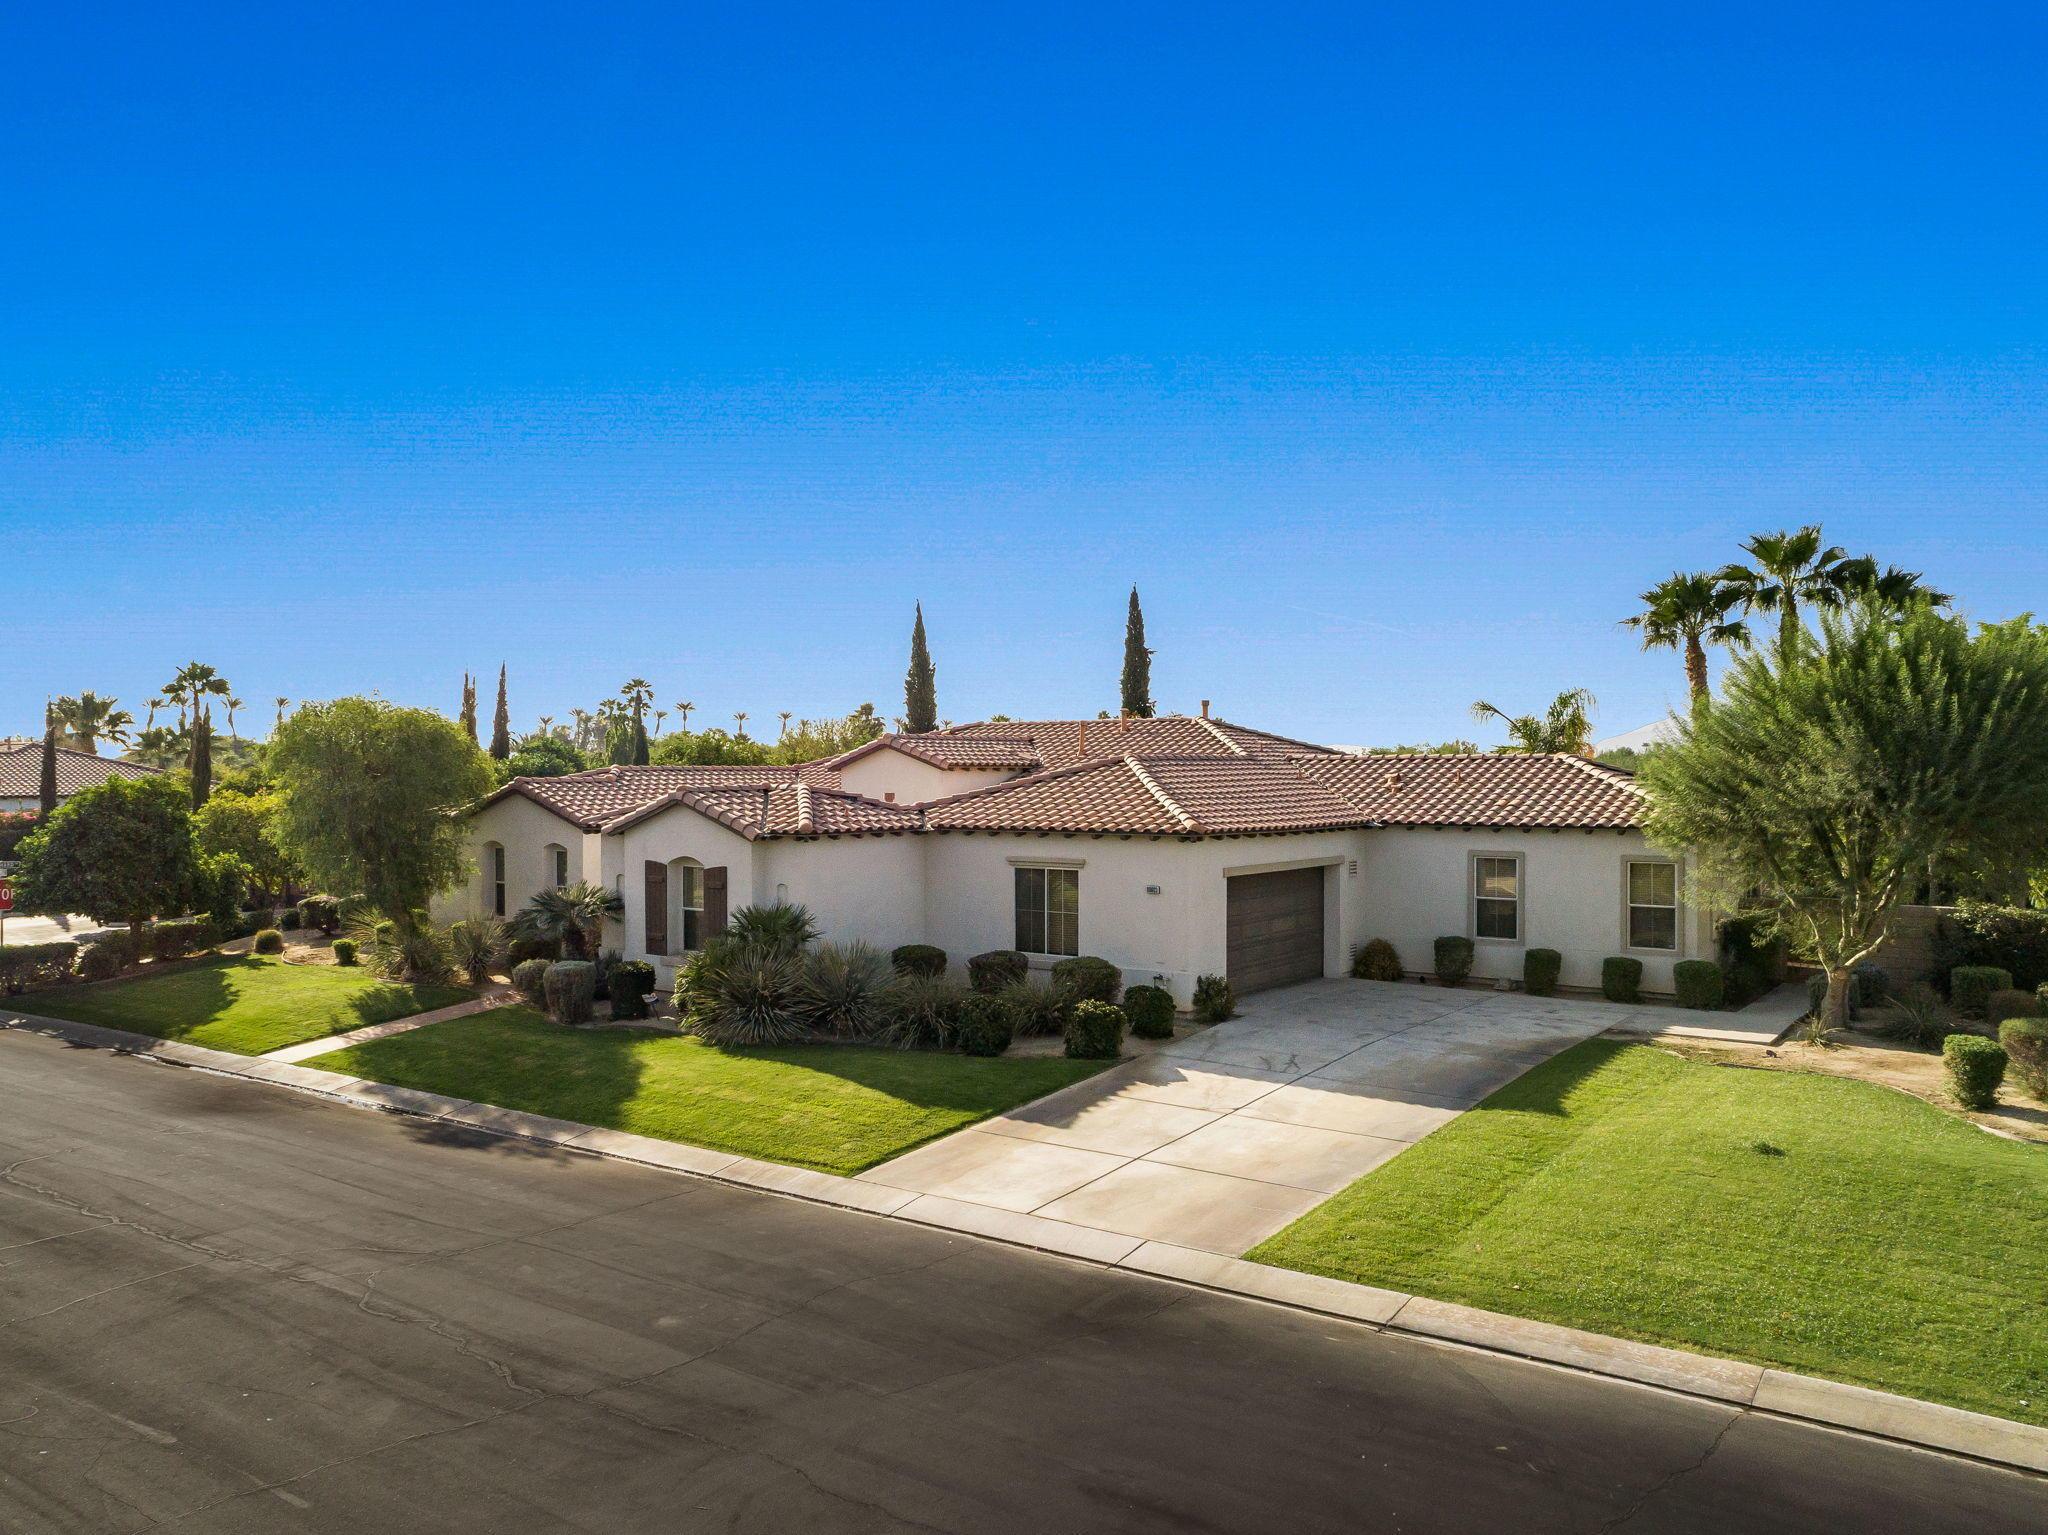 Photo of 80603 Apricot Lane, Indio, CA 92201